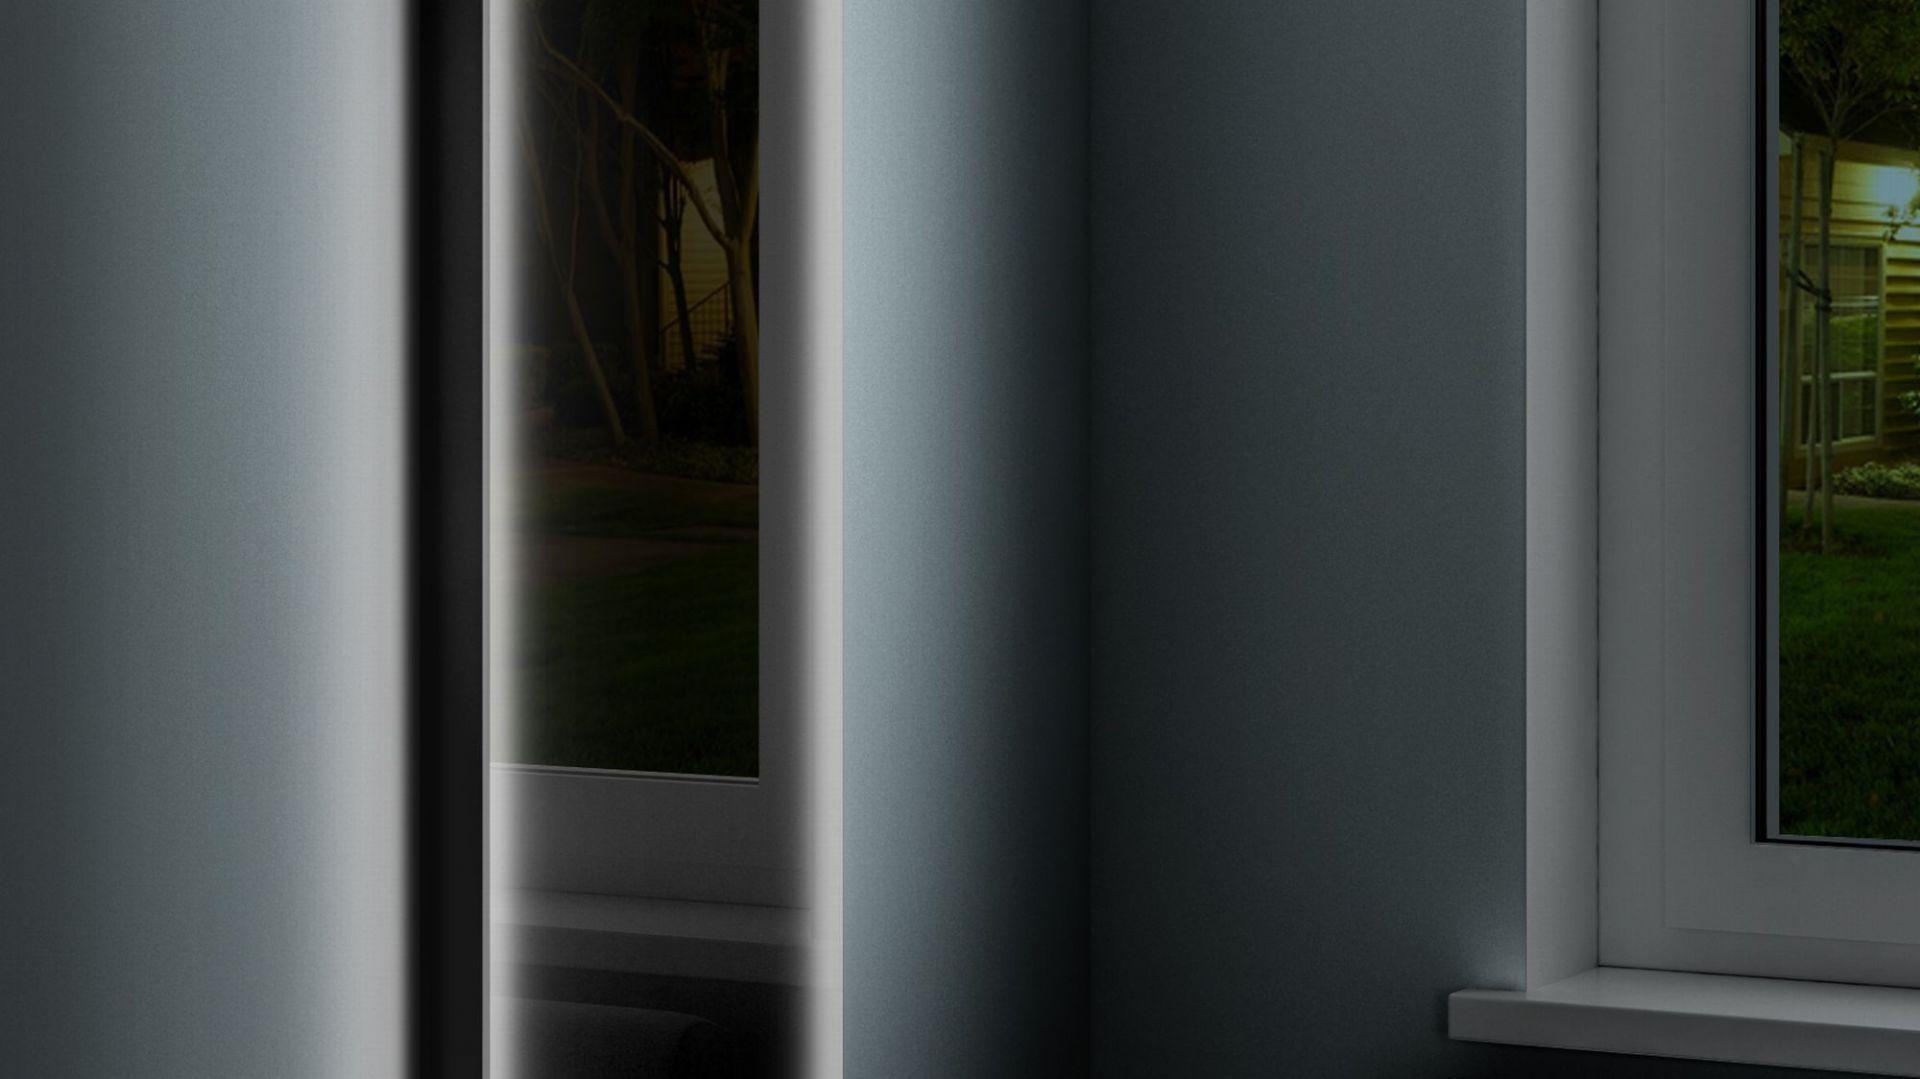 Grzejnik Vitro LED. Fot. Luxrad